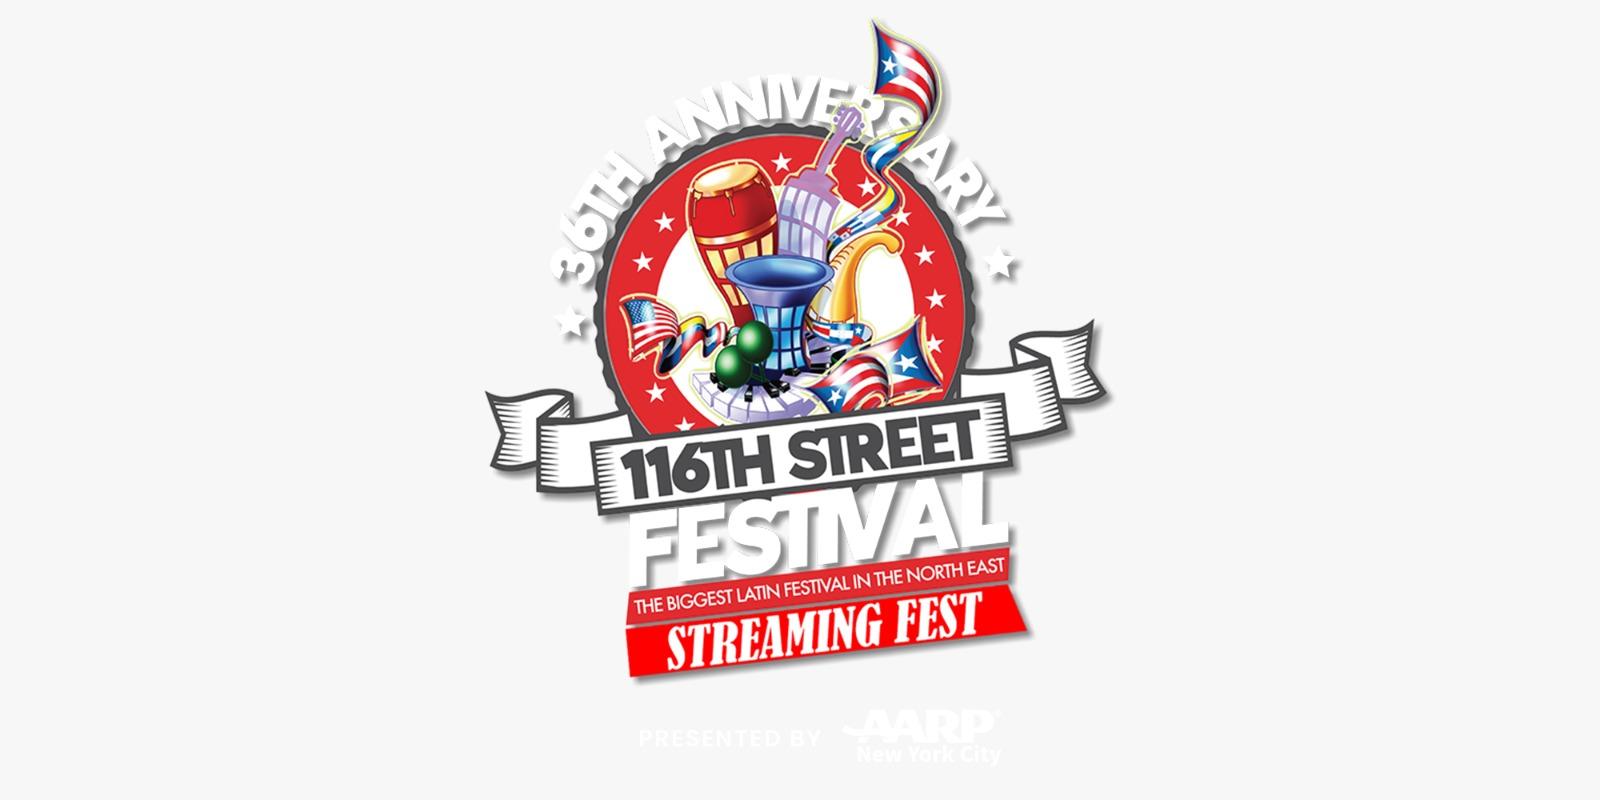 116th Street Virtual Festival